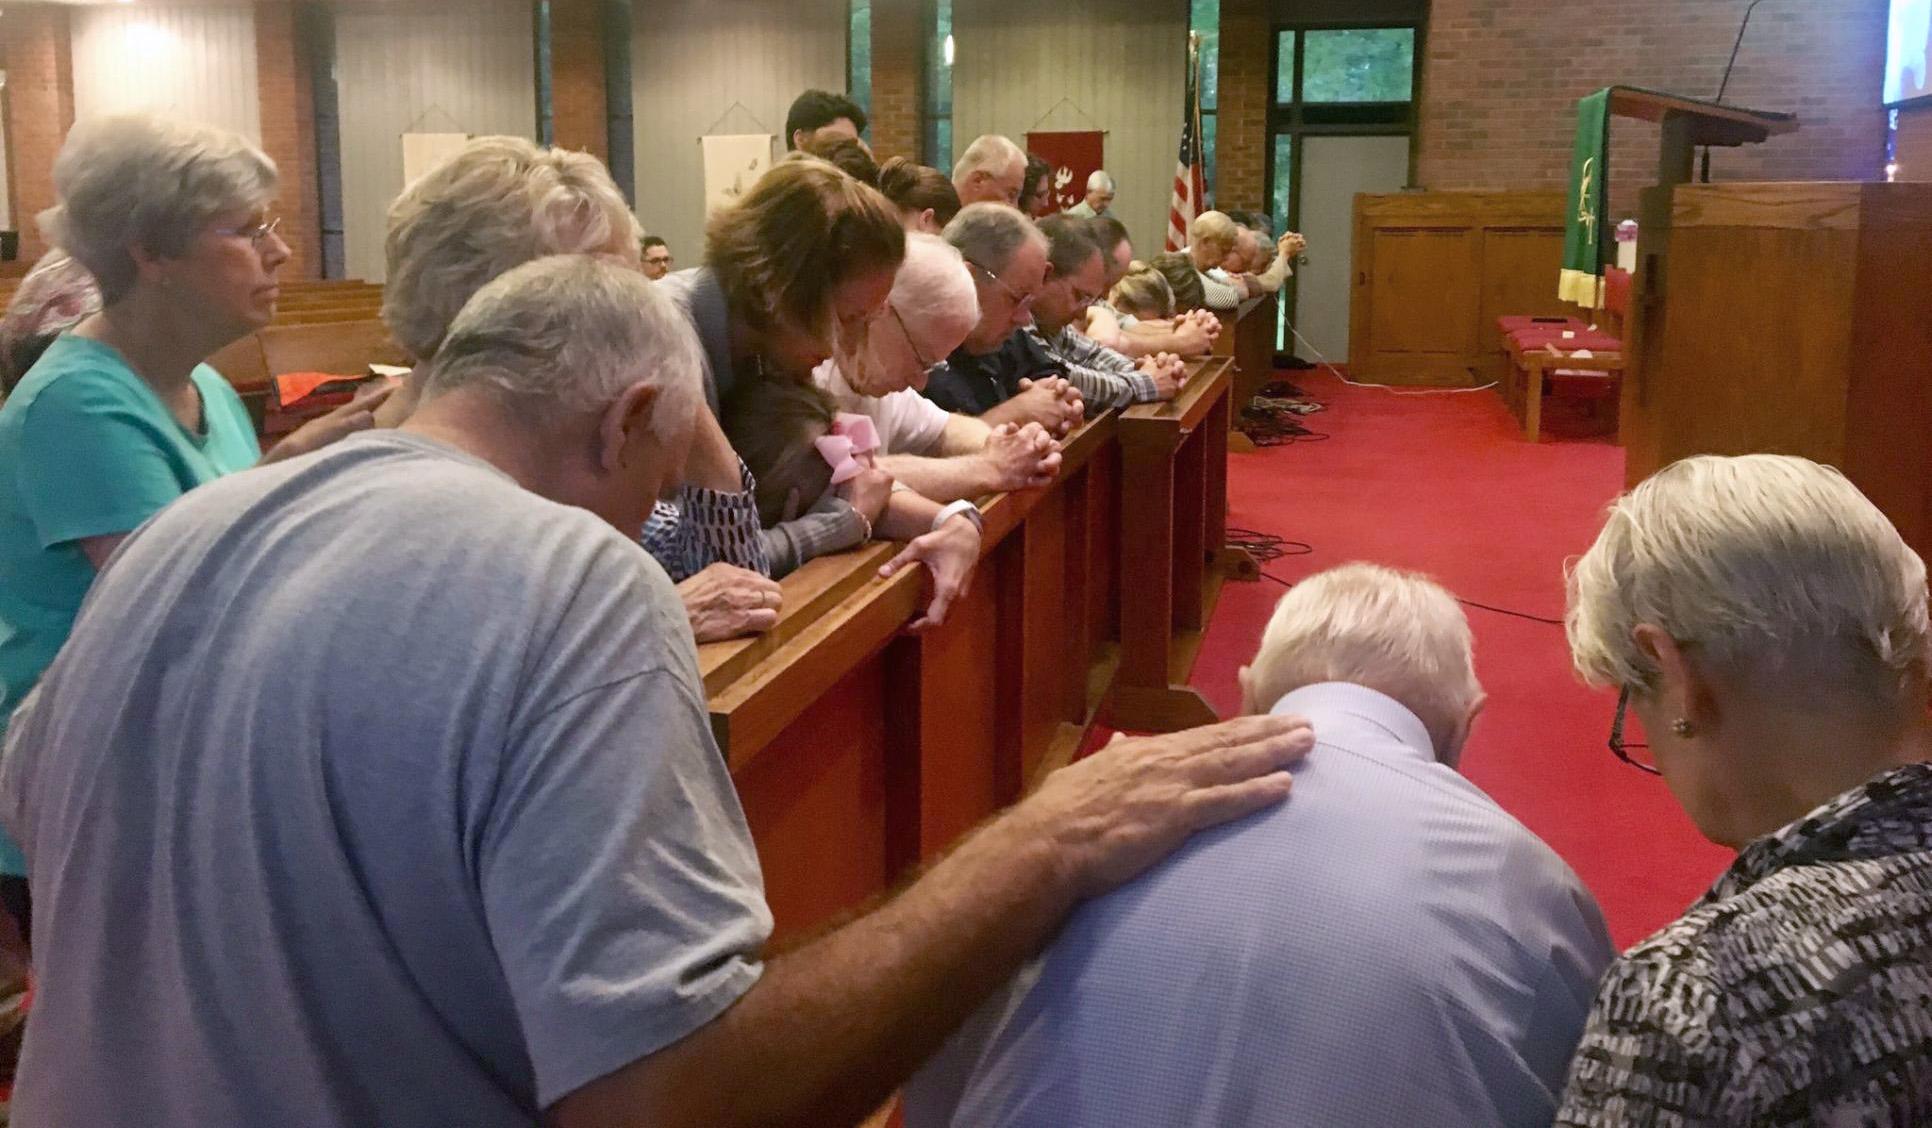 Parishioners pray for Jadon Olsen at Saint Luke United Methodist Church in Laurinburg, N.C. Photo courtesy of the Rev. William A. Olsen.